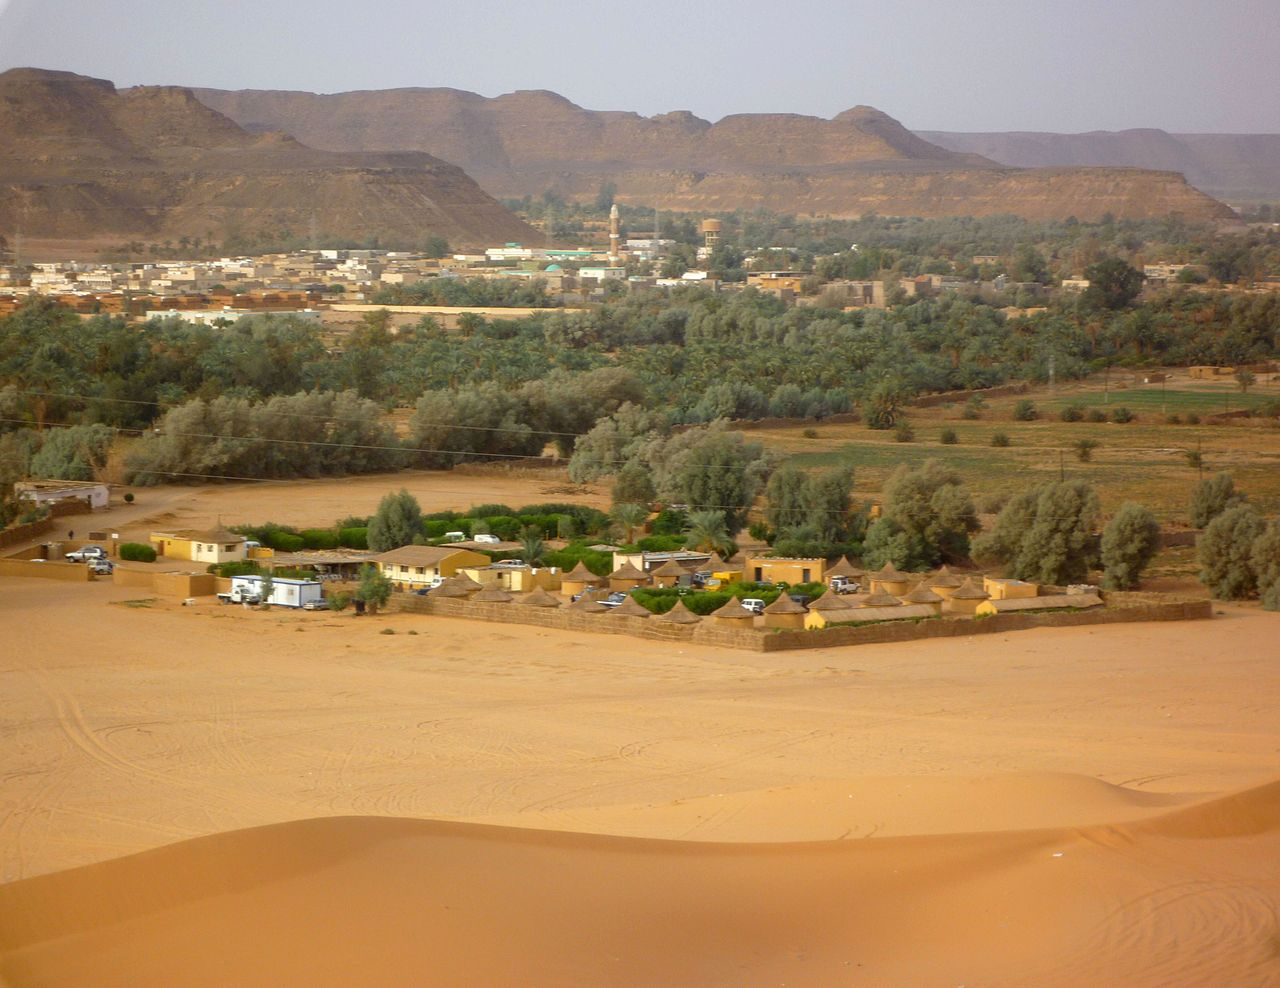 El Fezzan